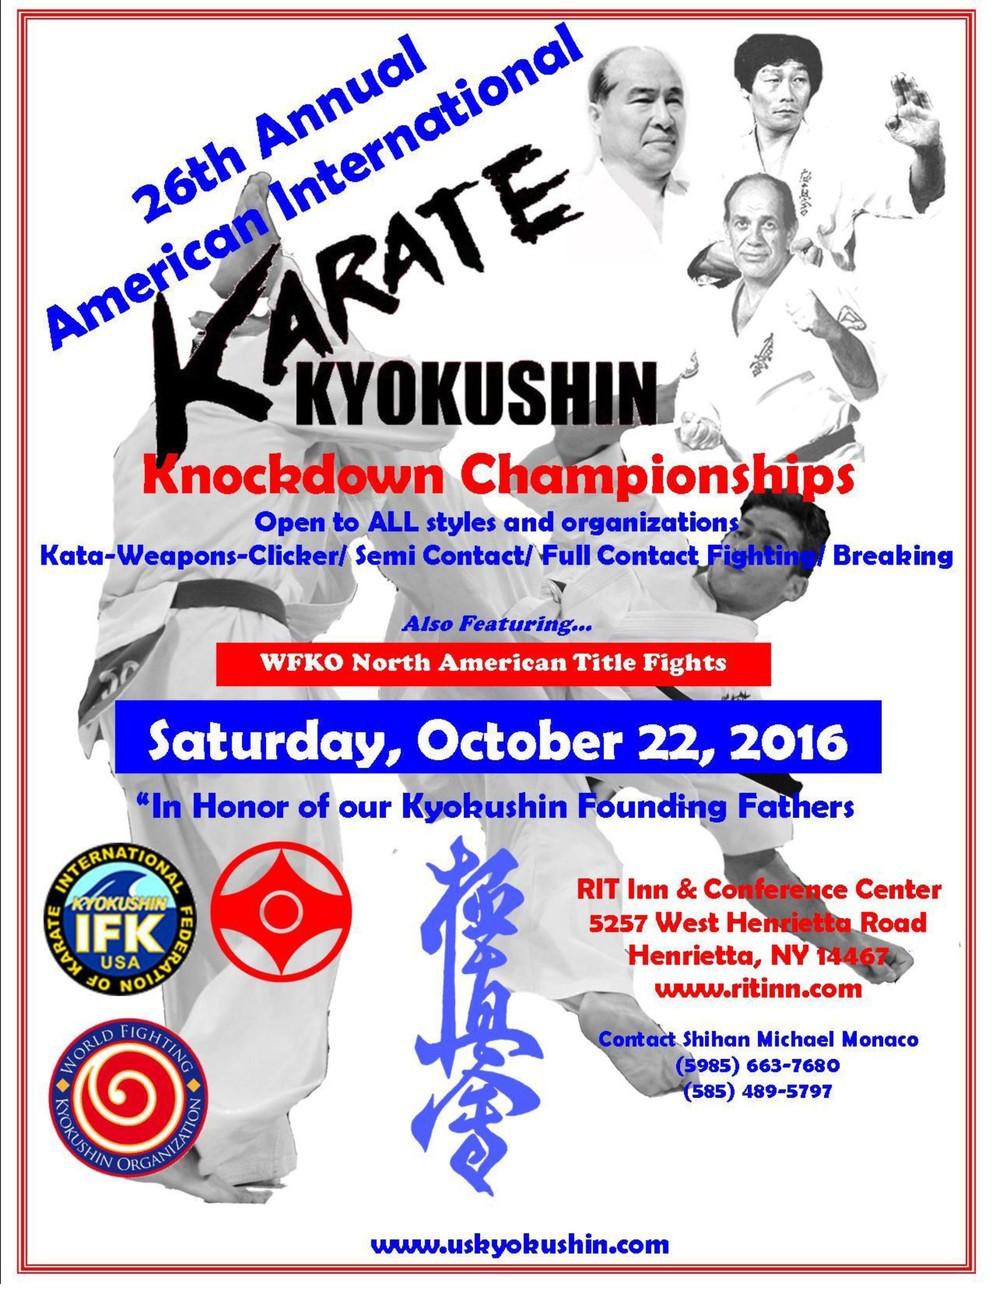 26th American International Karate Championships 2016 ...